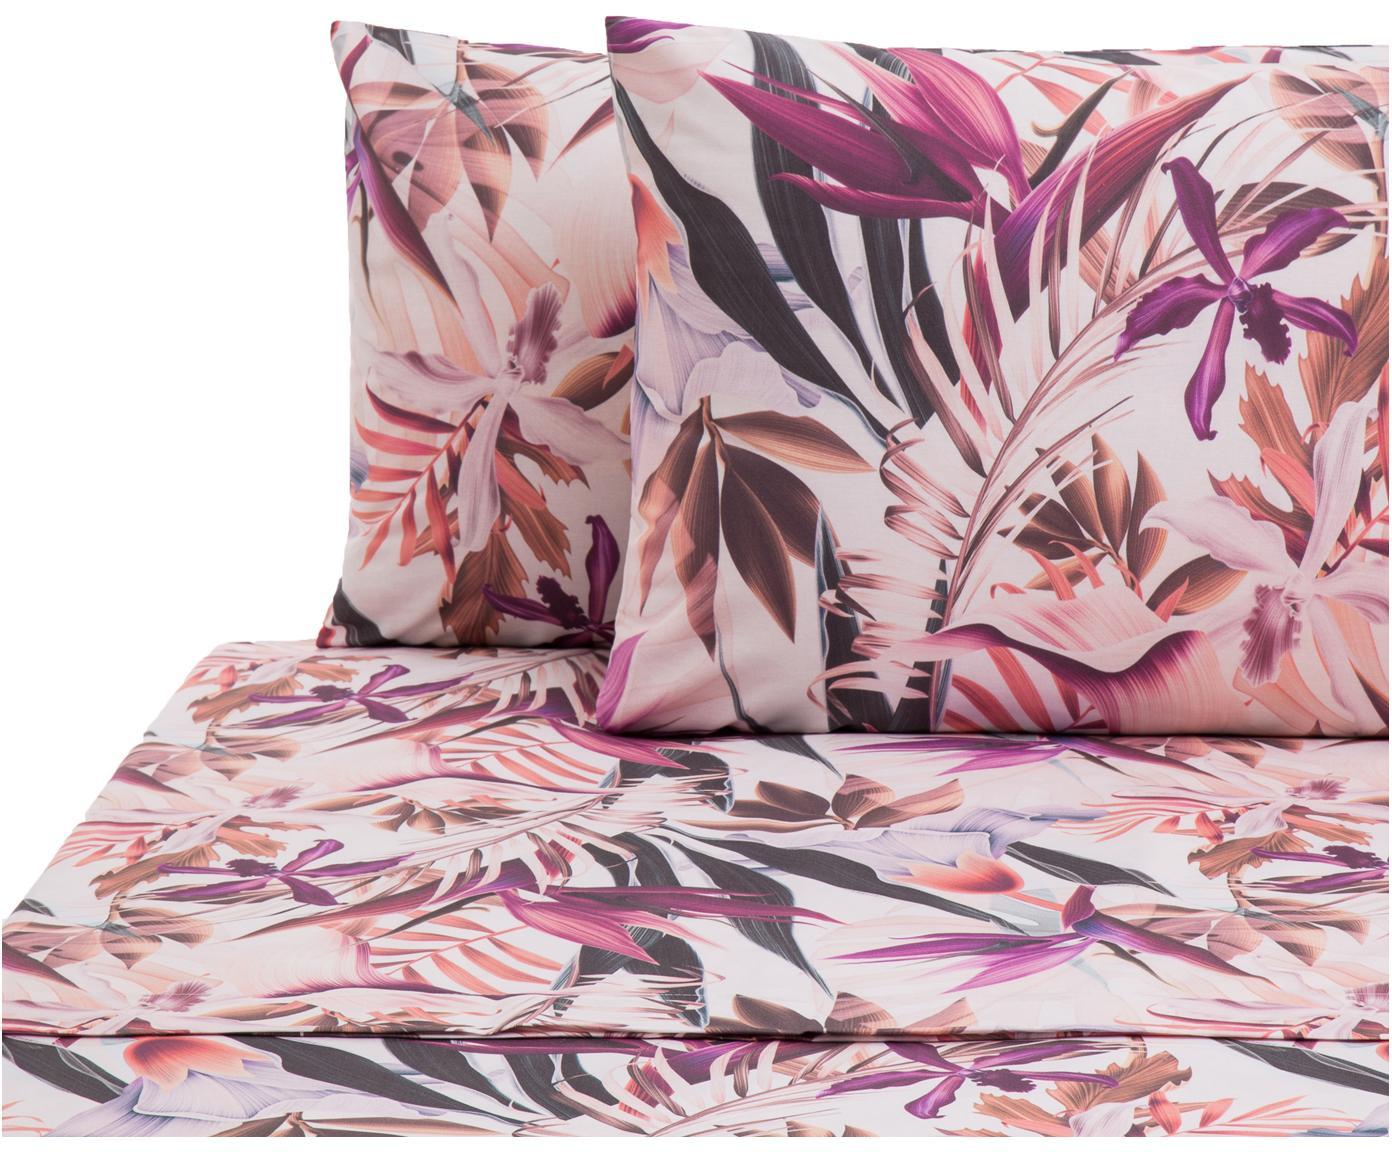 Sábana encimera Asia Pasion, Algodón, Rosa, lila, blanco, Cama 90 cm (160 x 270 cm)